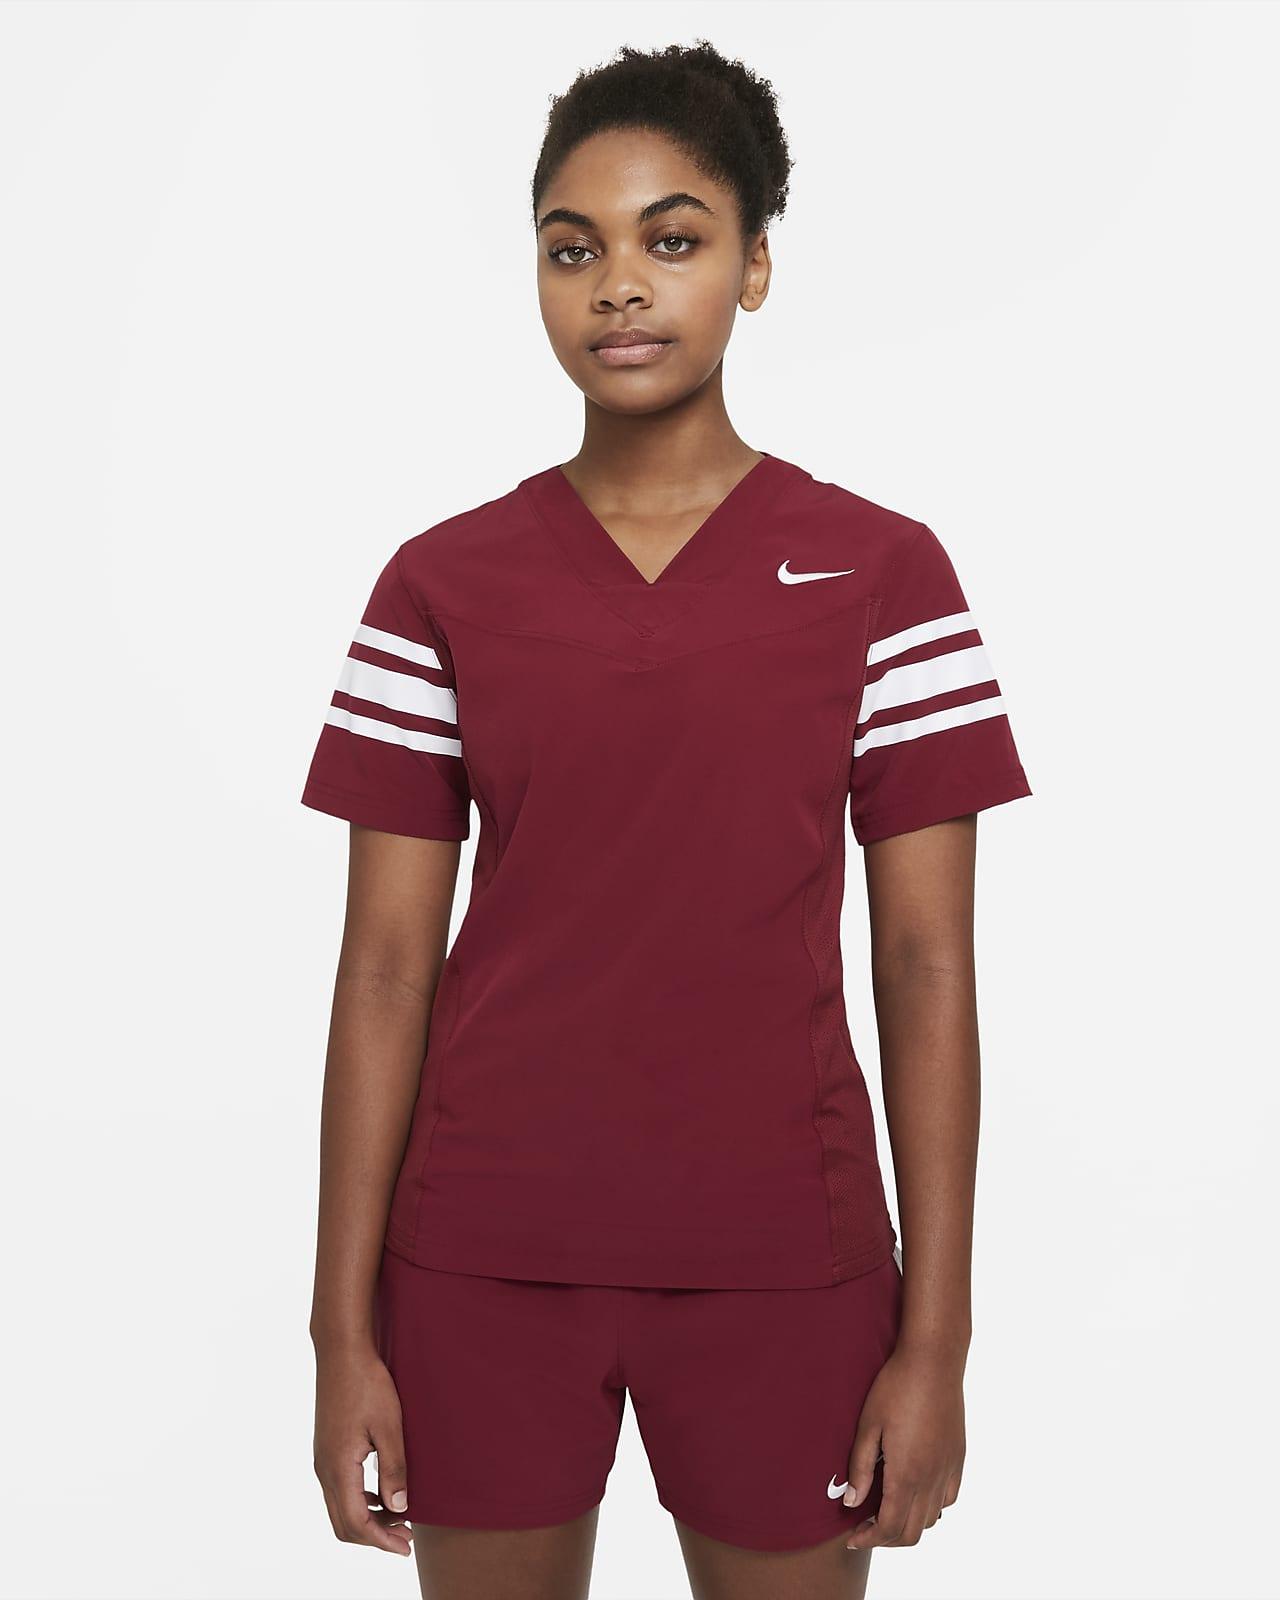 Camiseta de fútbol con bandera para mujer Nike Vapor (Stock)